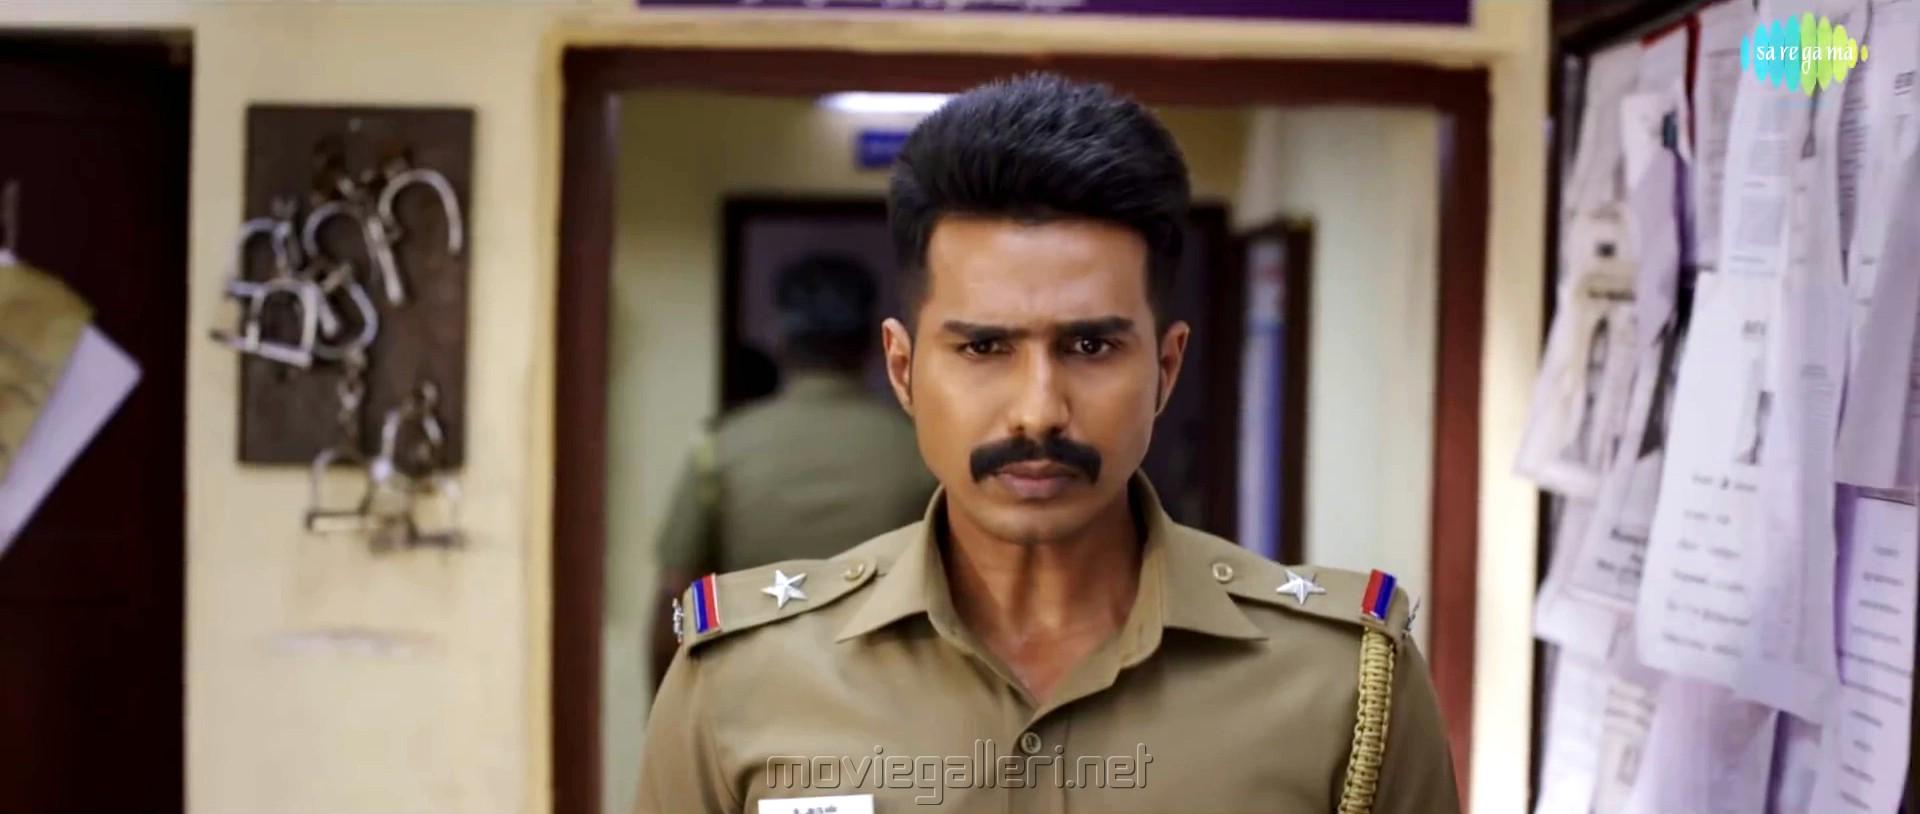 ratchasan movie online download tamilrockers